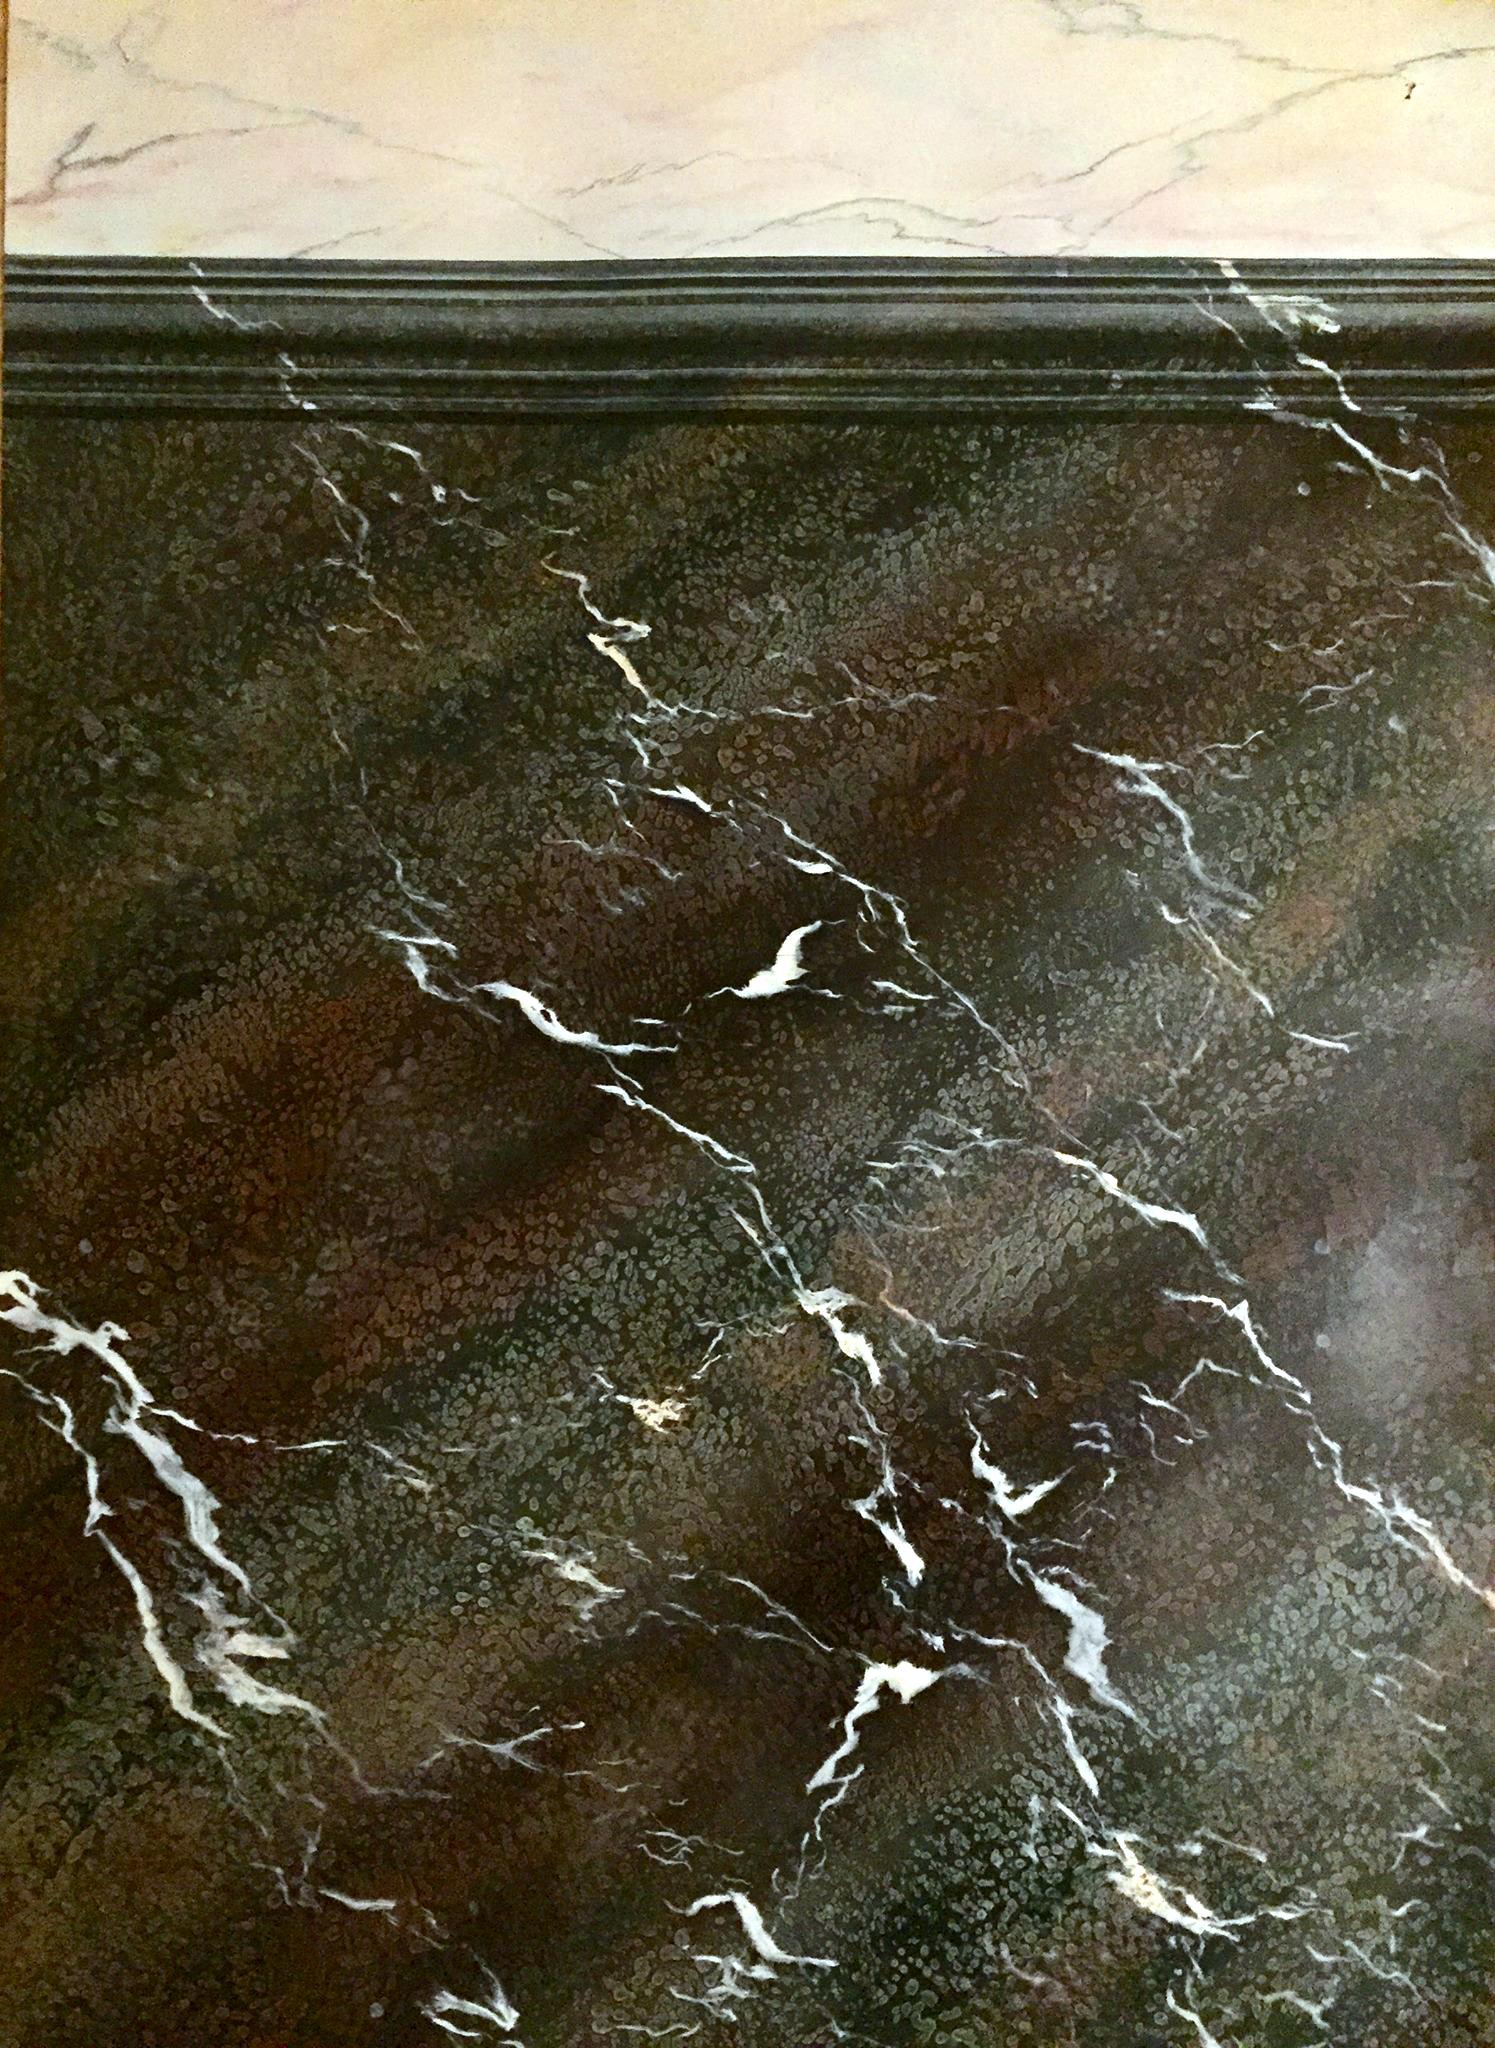 Imitation de marbre campan mélangé